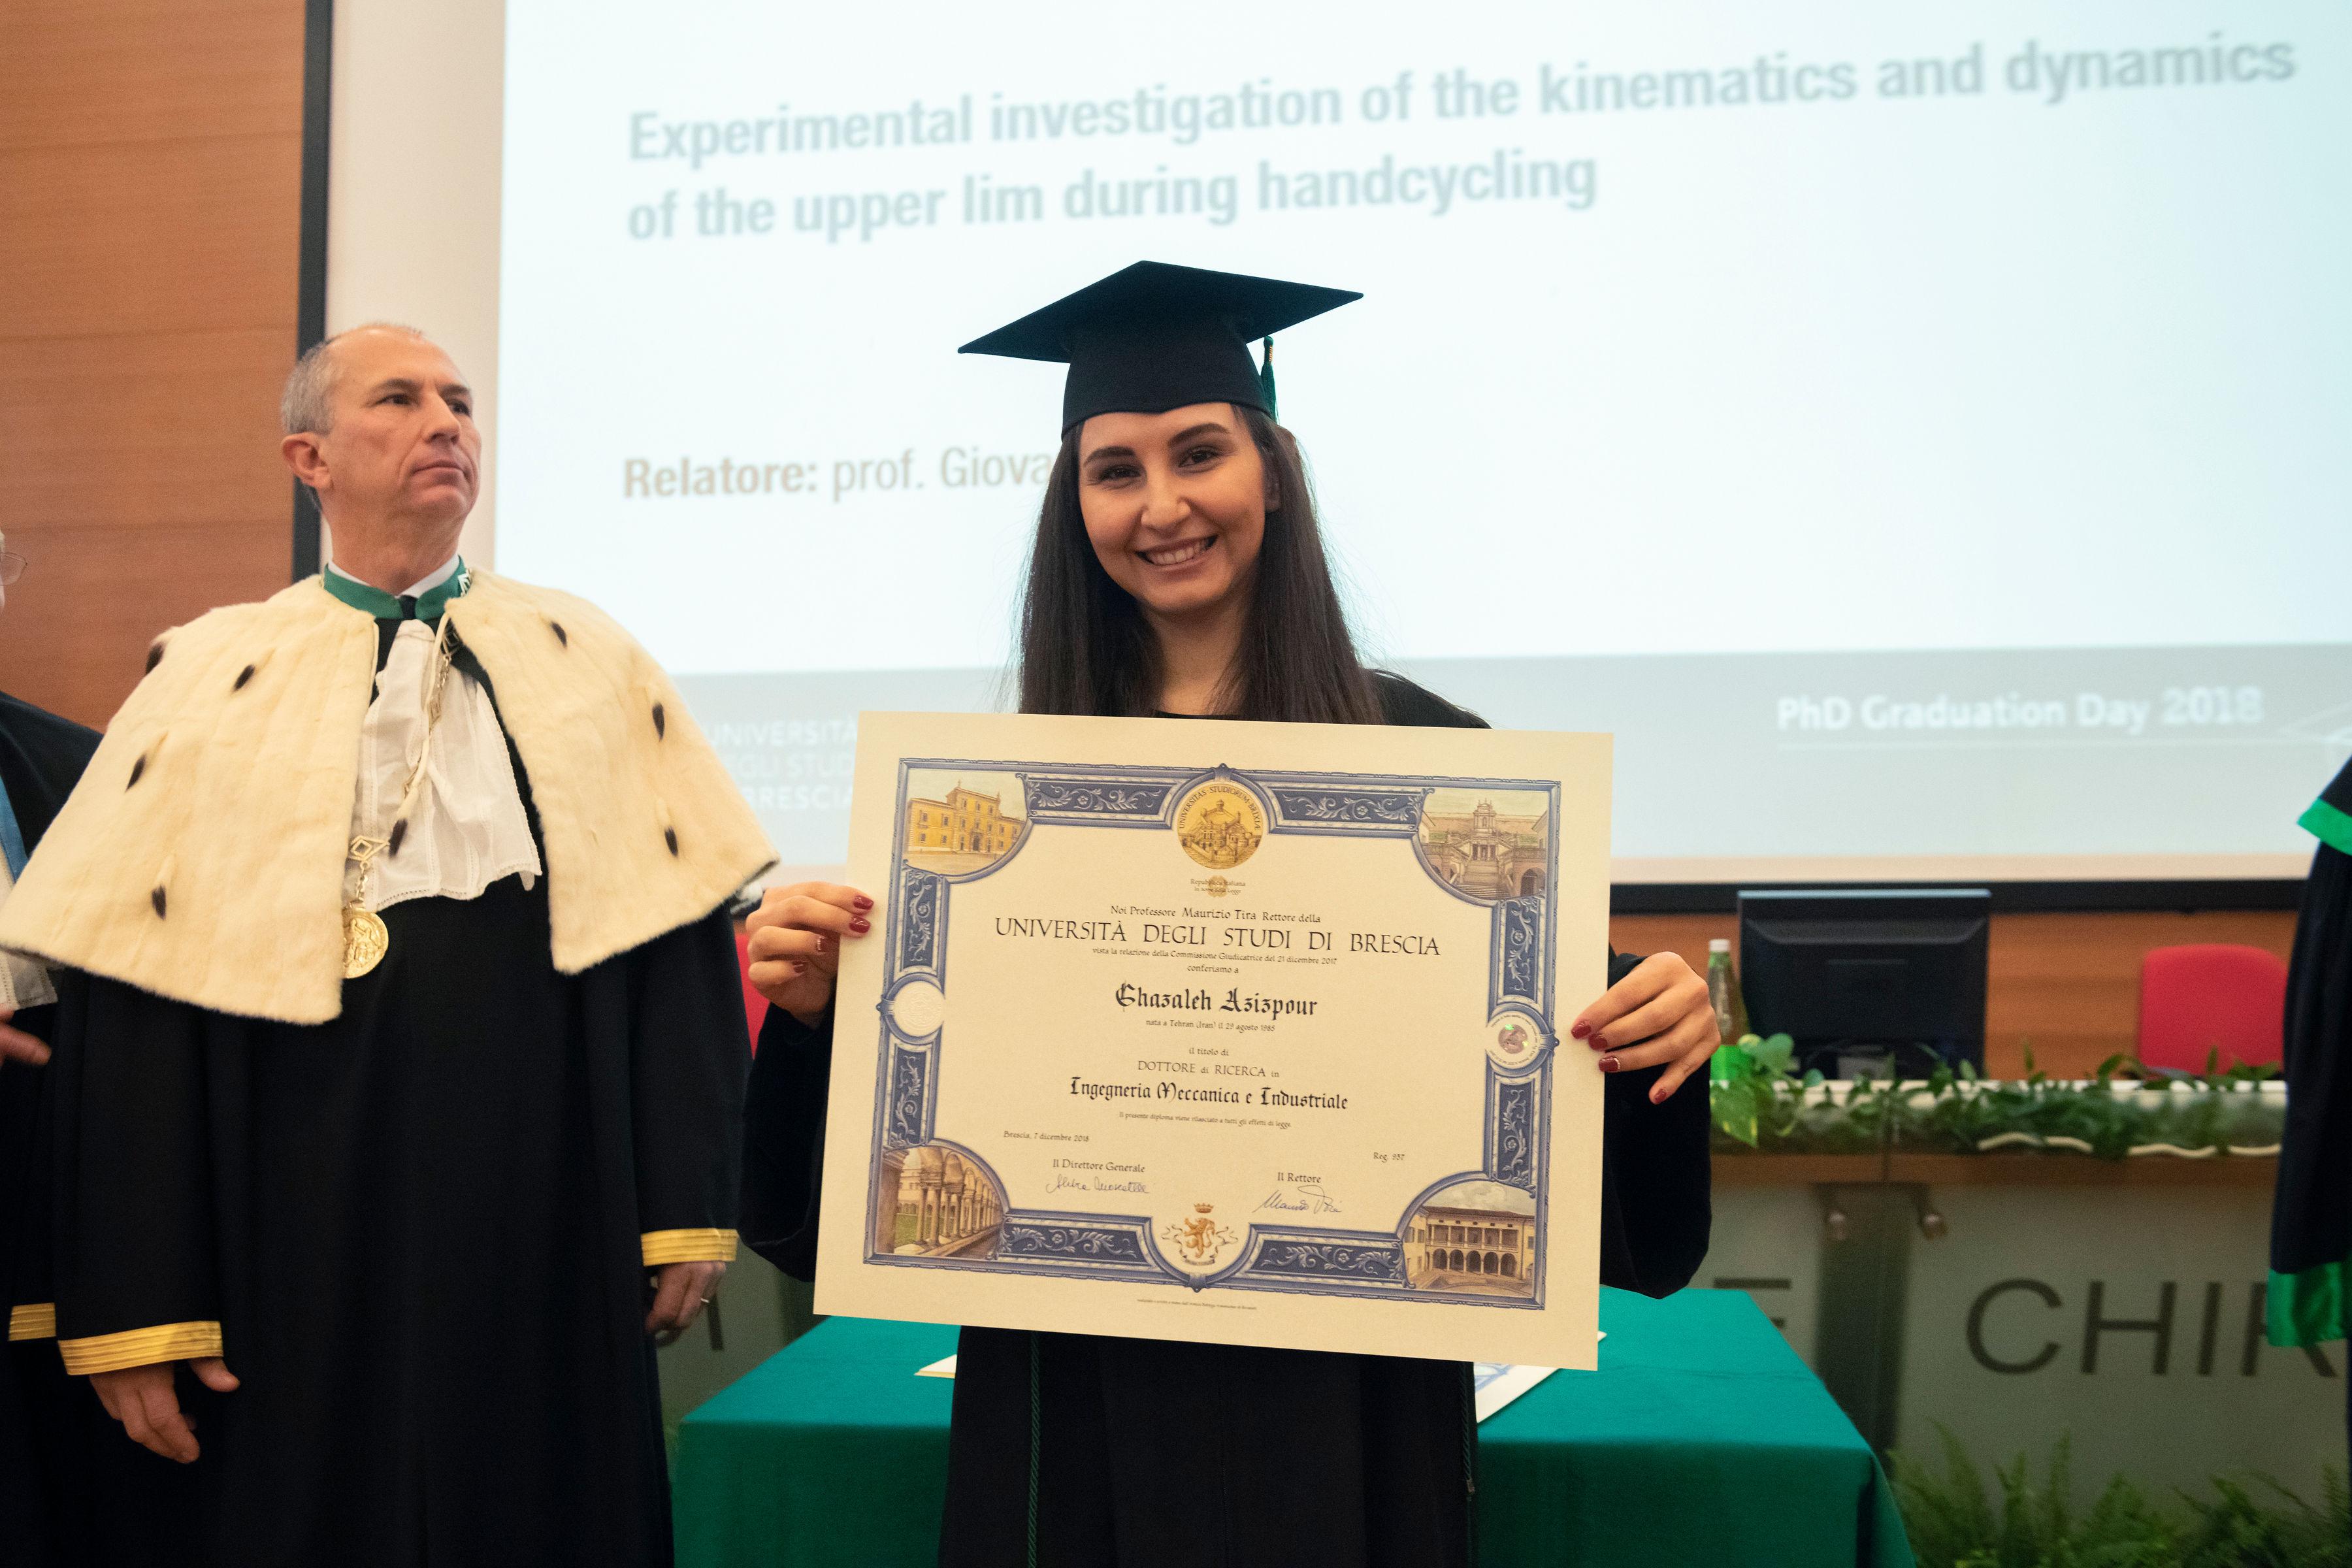 Ghazaleh Azizpour